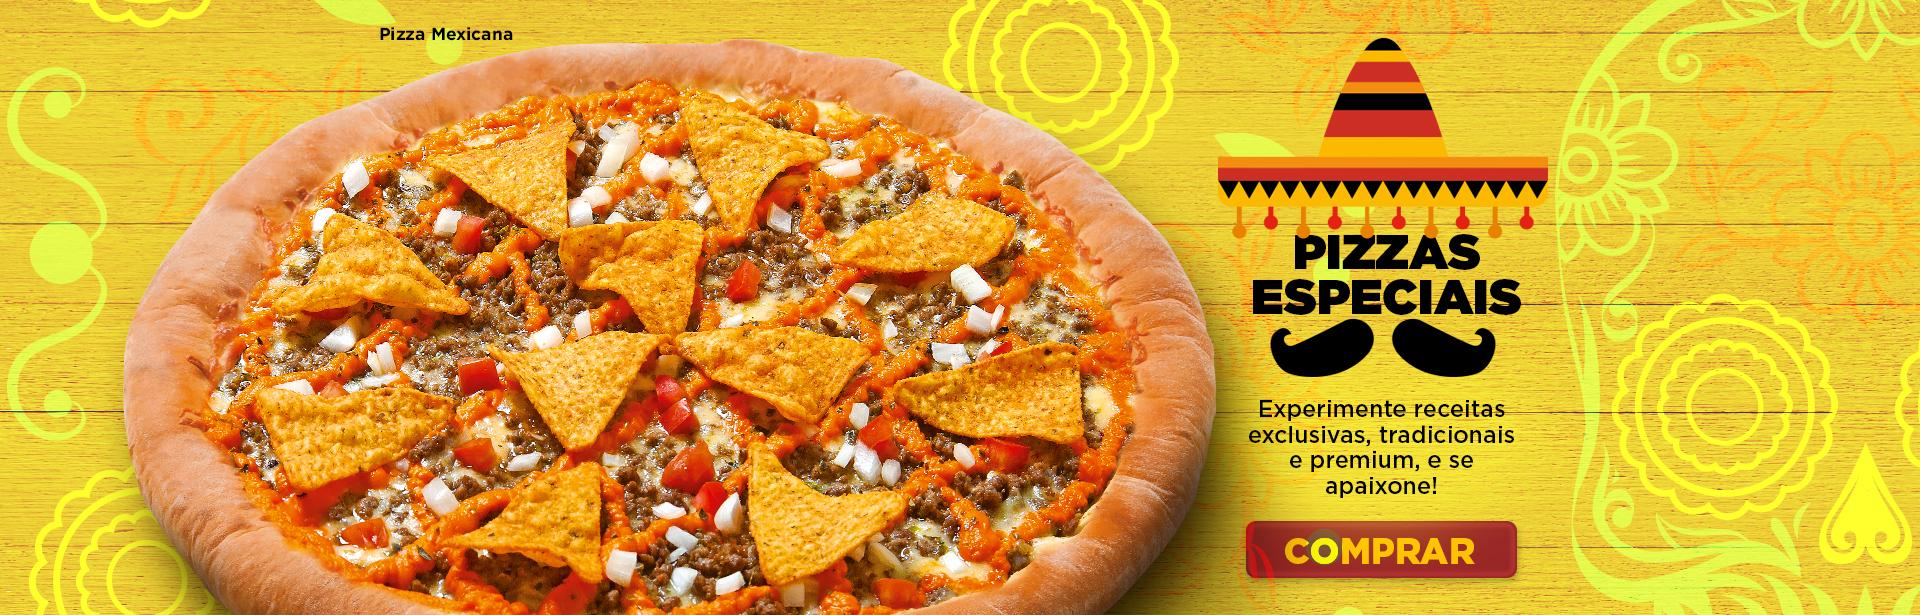 Pizzas - FLP